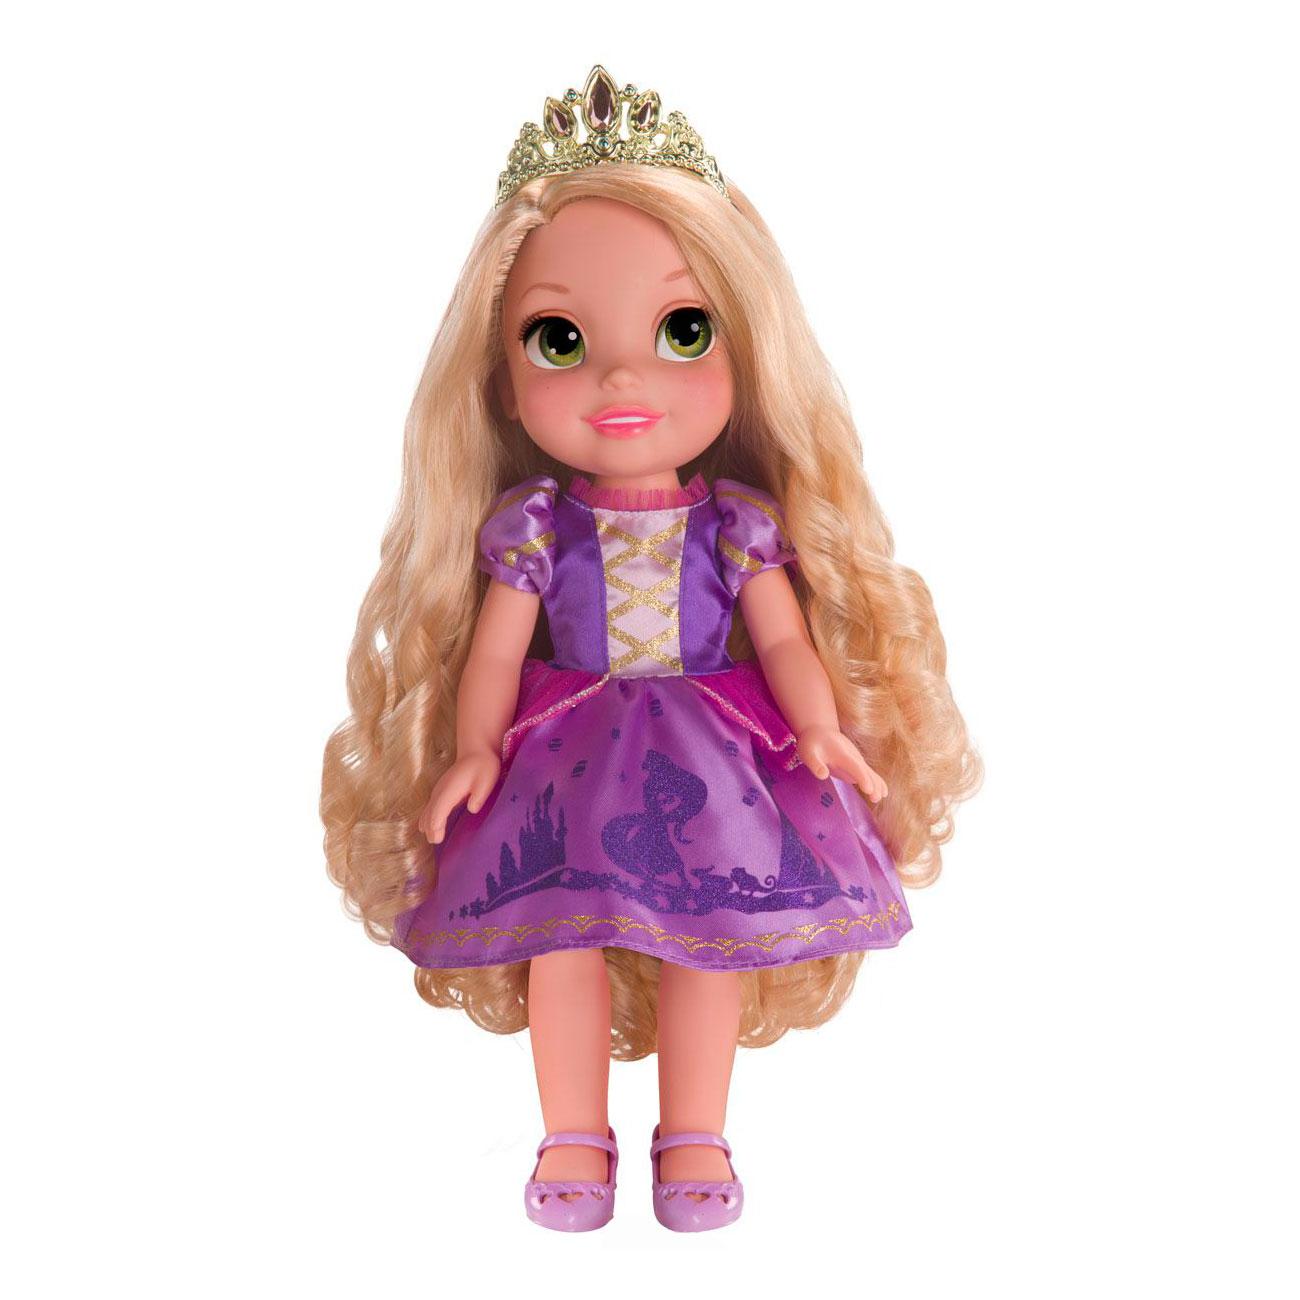 ����� Disney Princess ������� ���������/������ 35 ��